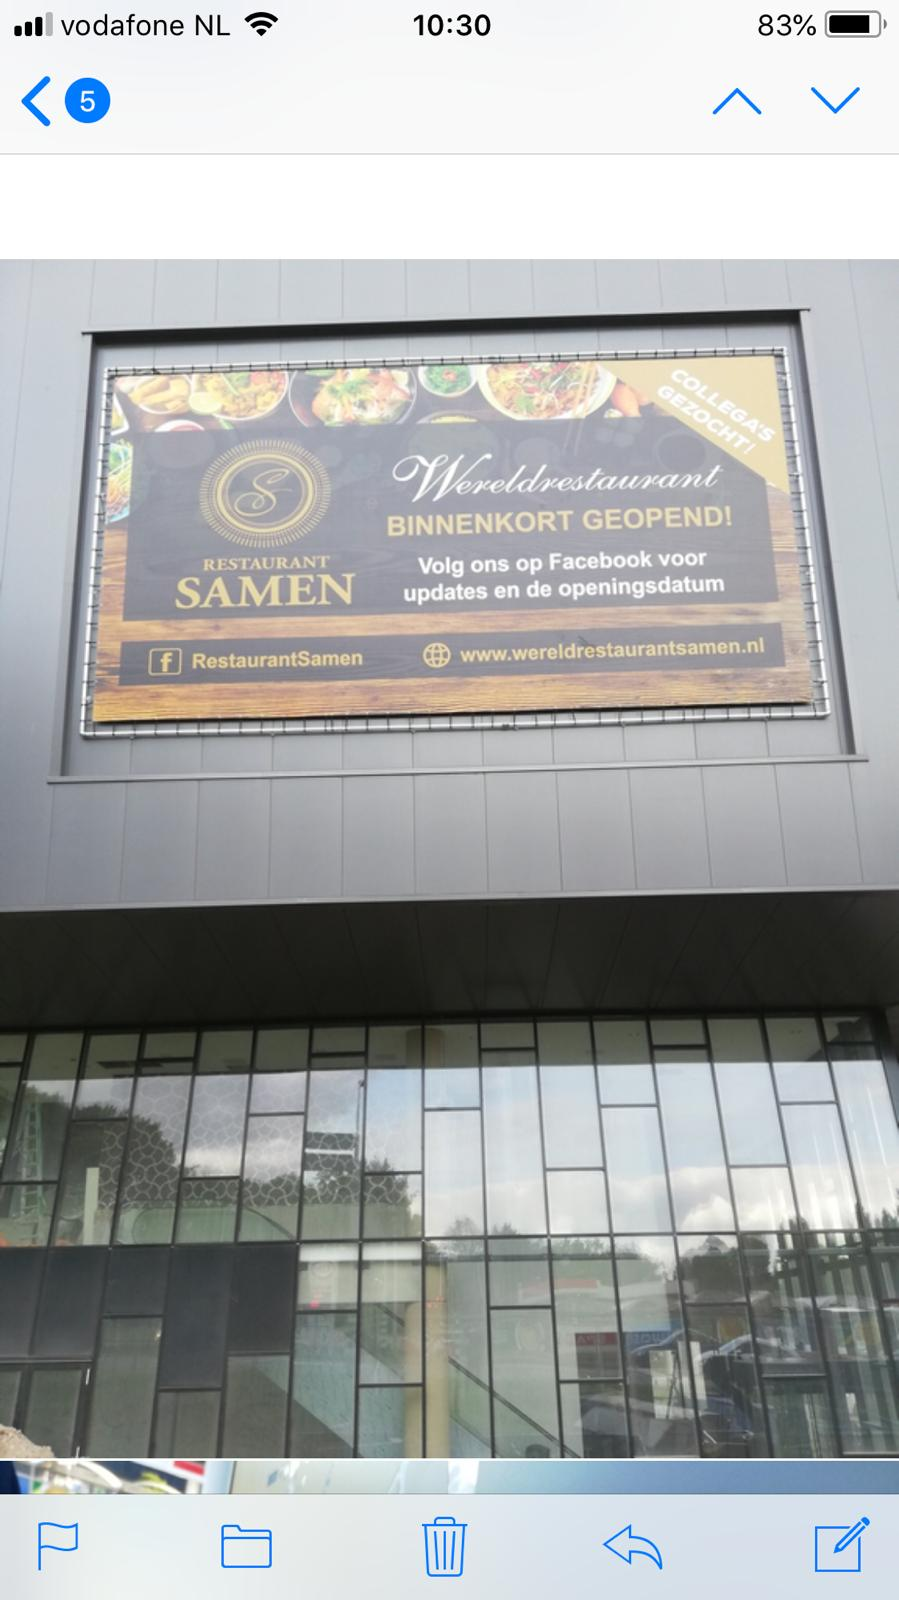 Restaurant Samen